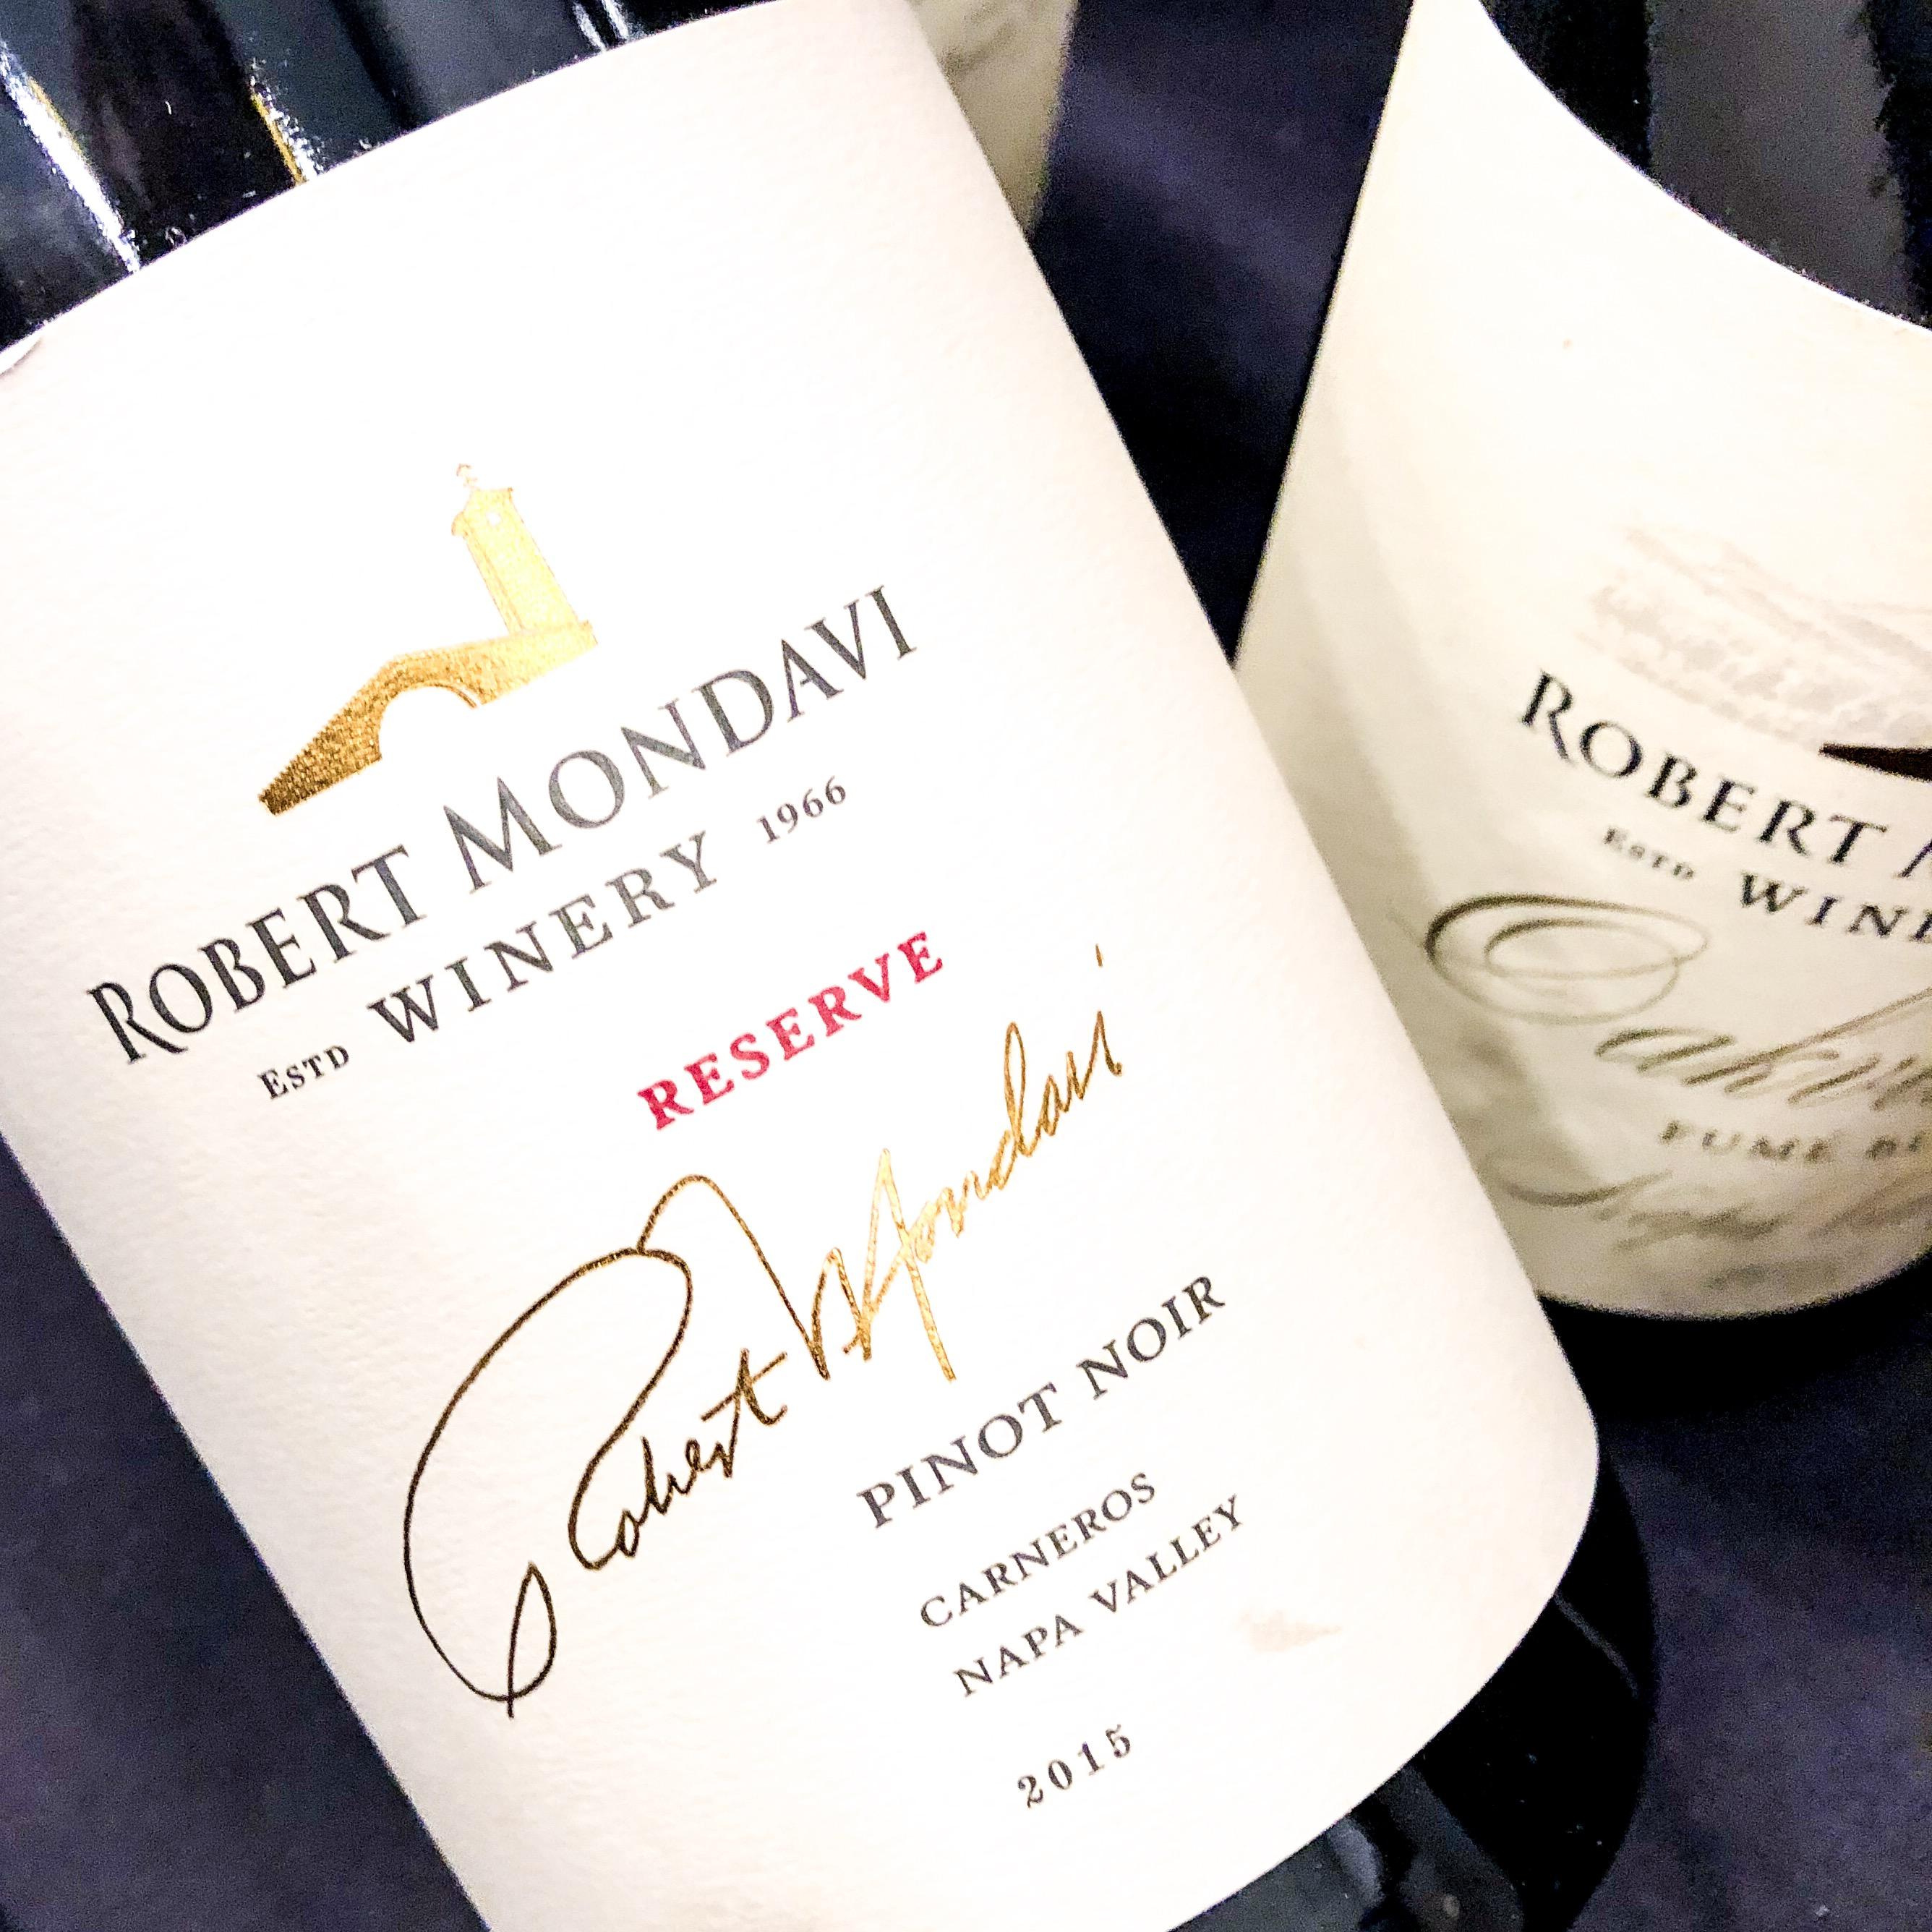 RMW Reserve Pinot Noir